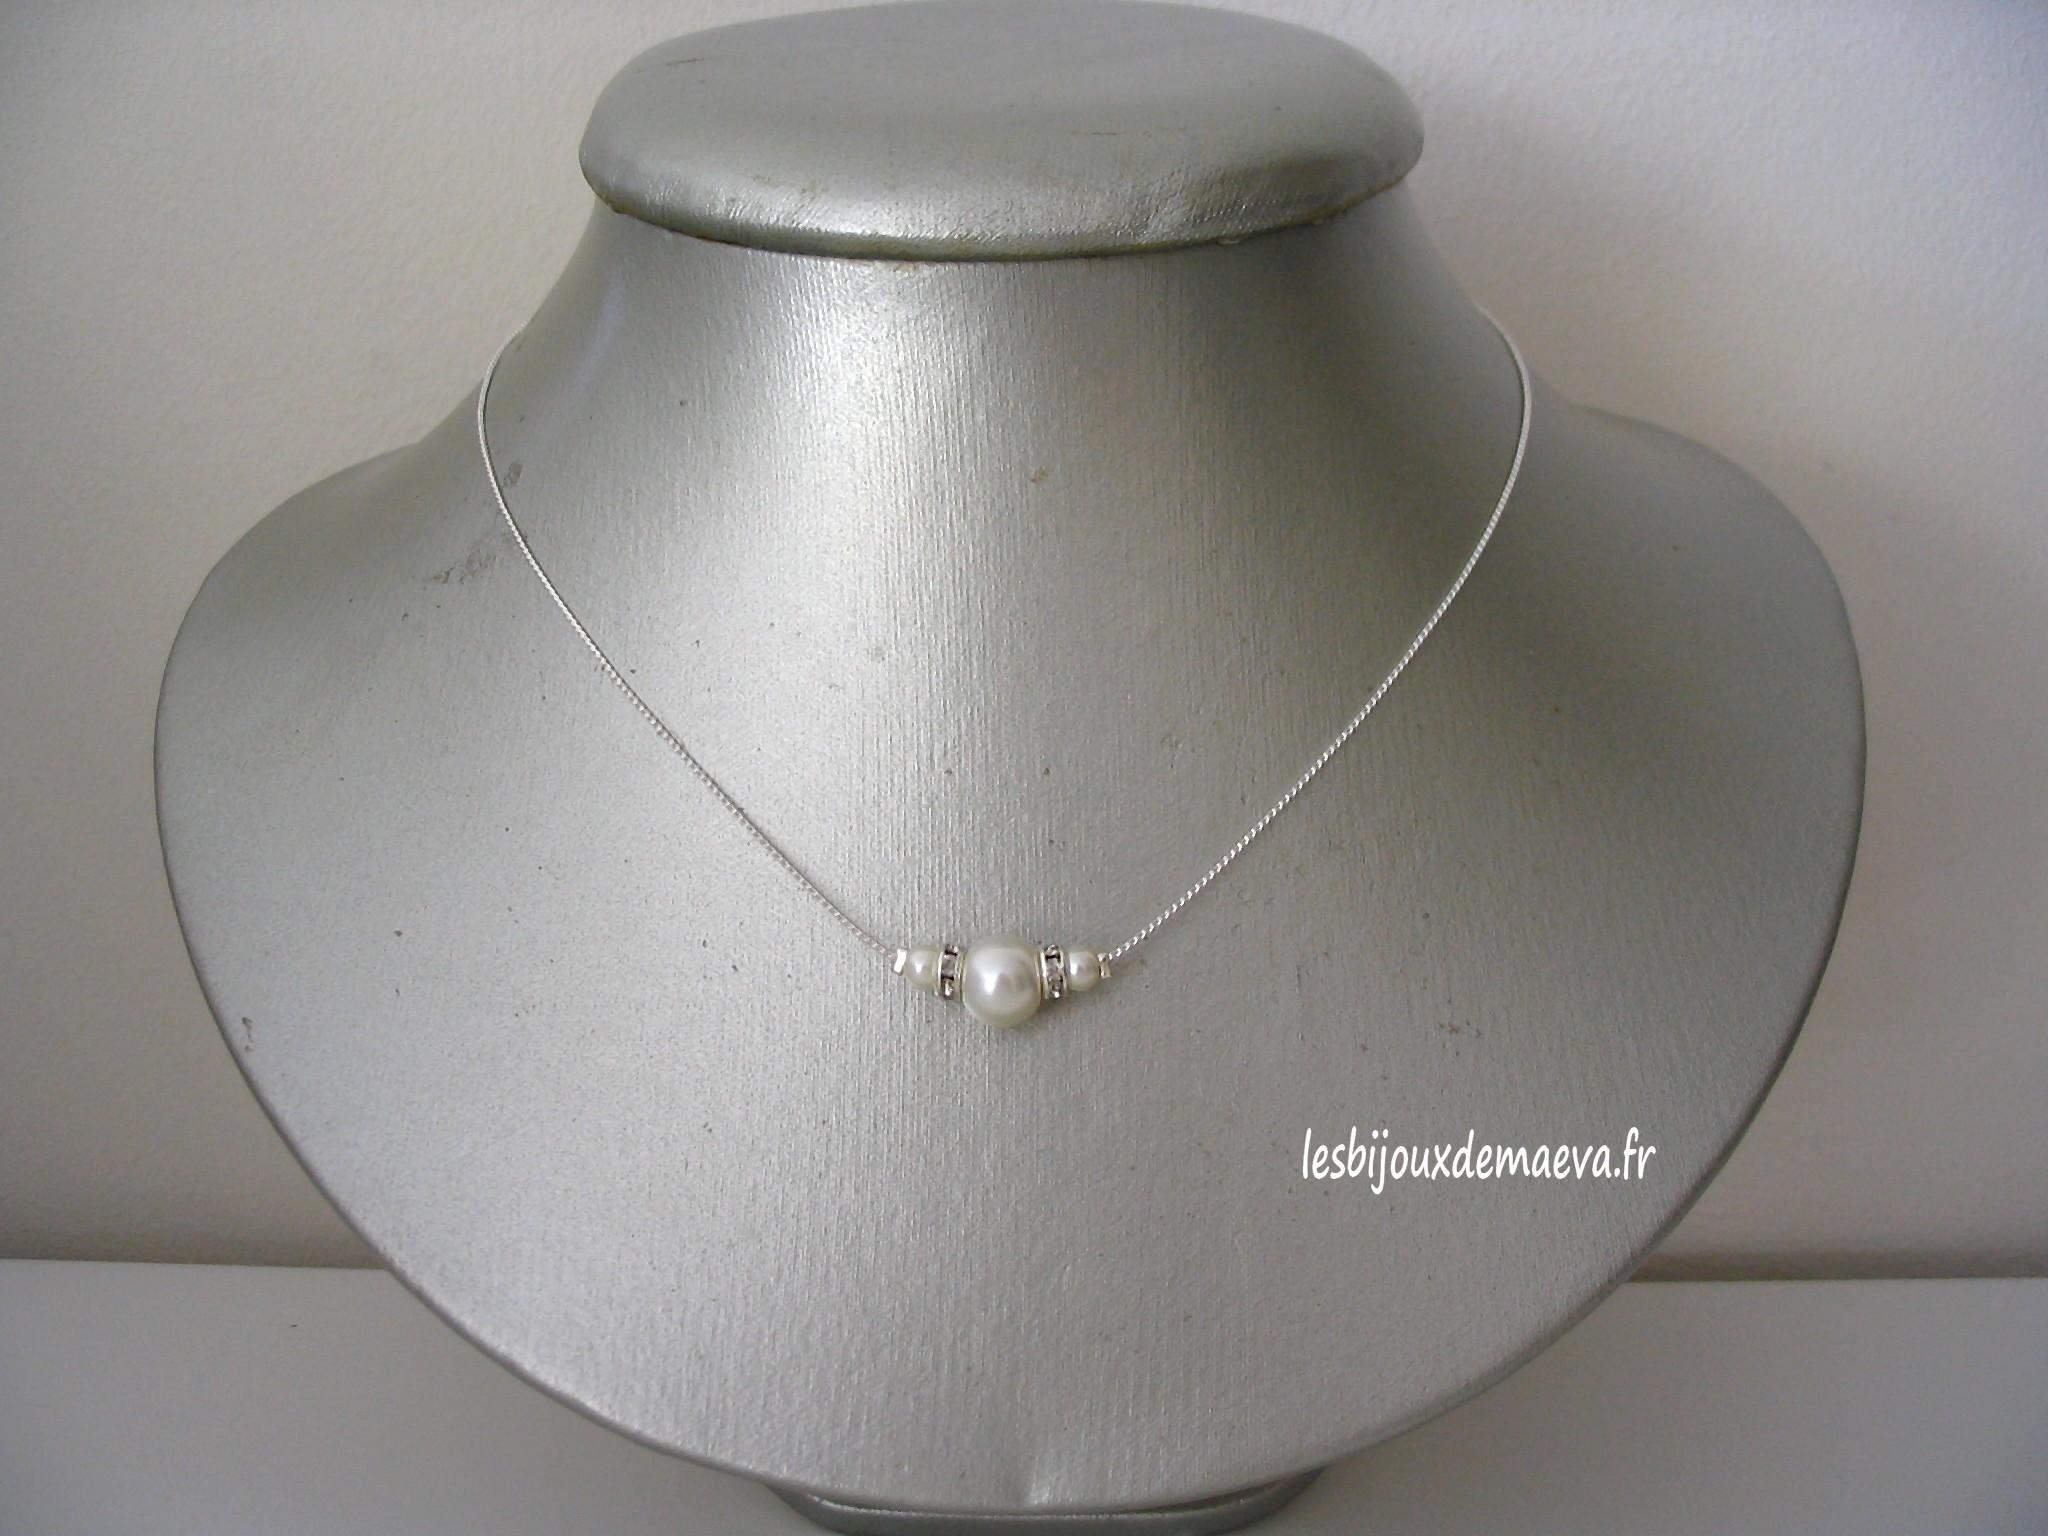 pretty cheap sale uk united kingdom Collier mariage perle ivoire et strass Discrète